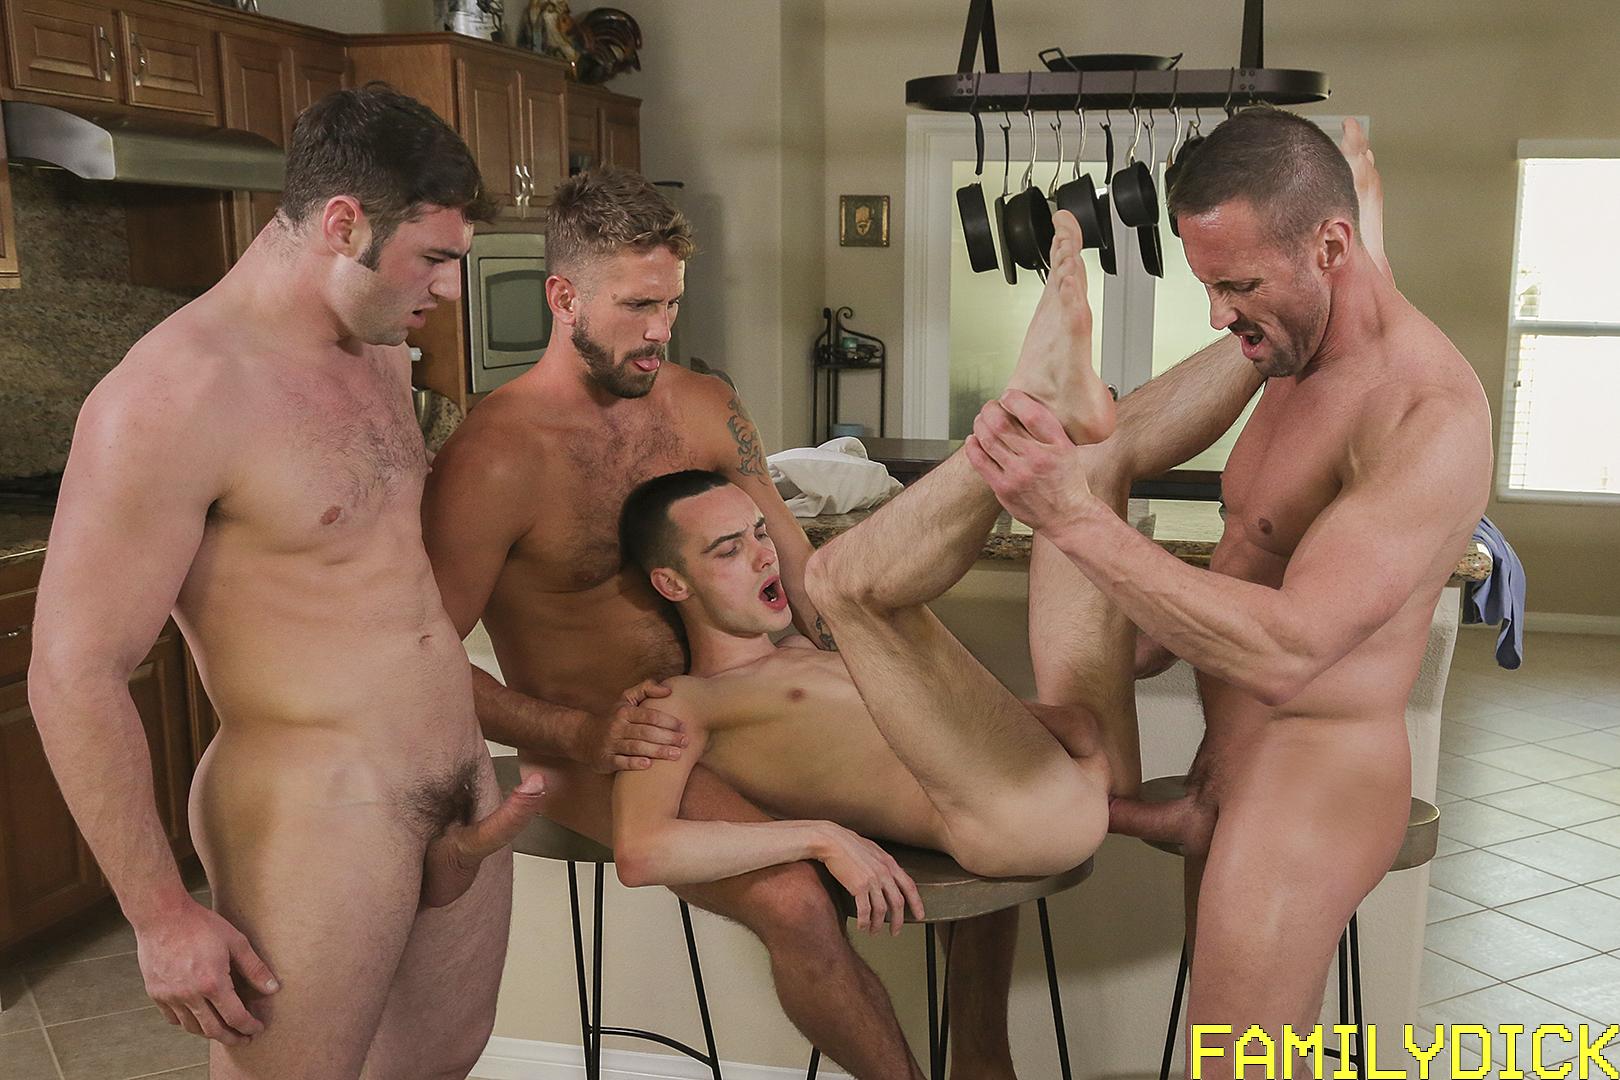 family-dick-dad-fucks-son-gay-porn-4